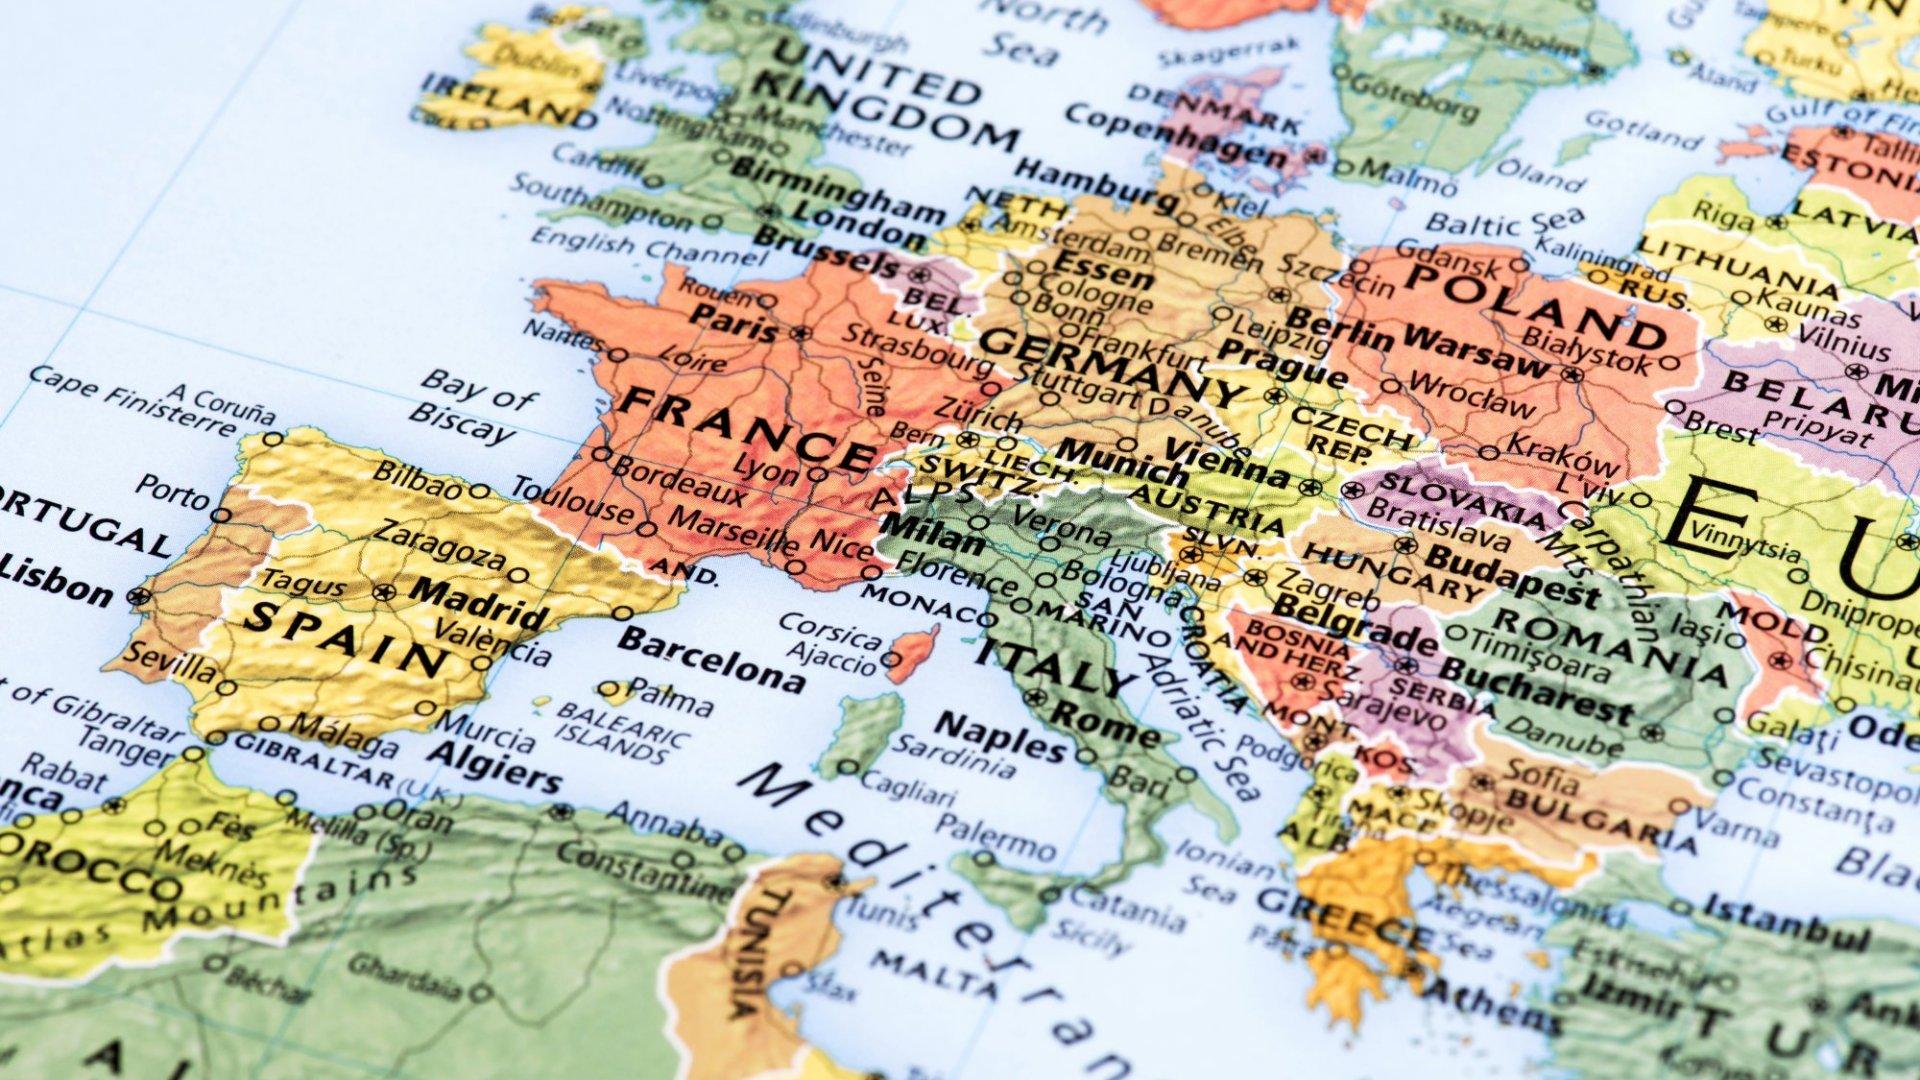 Considering European opportunities